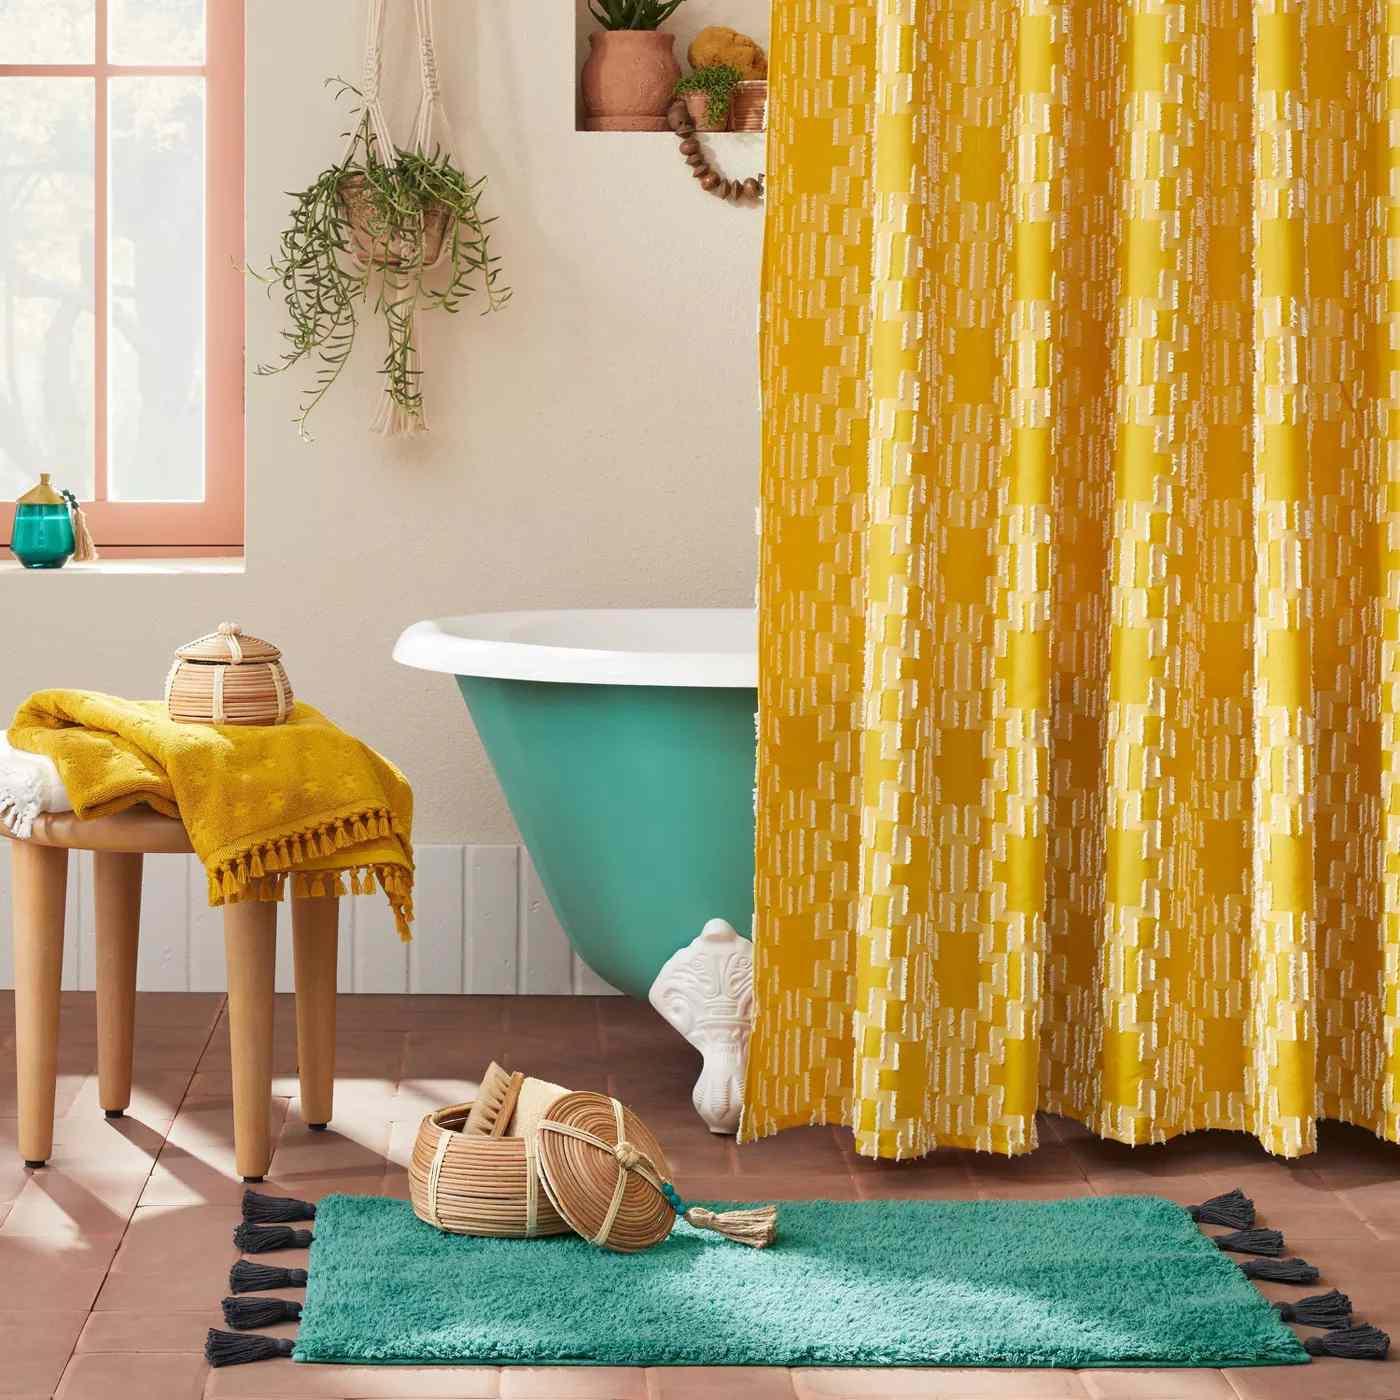 Yellow Geo Shower Curtain in boho bathroom.